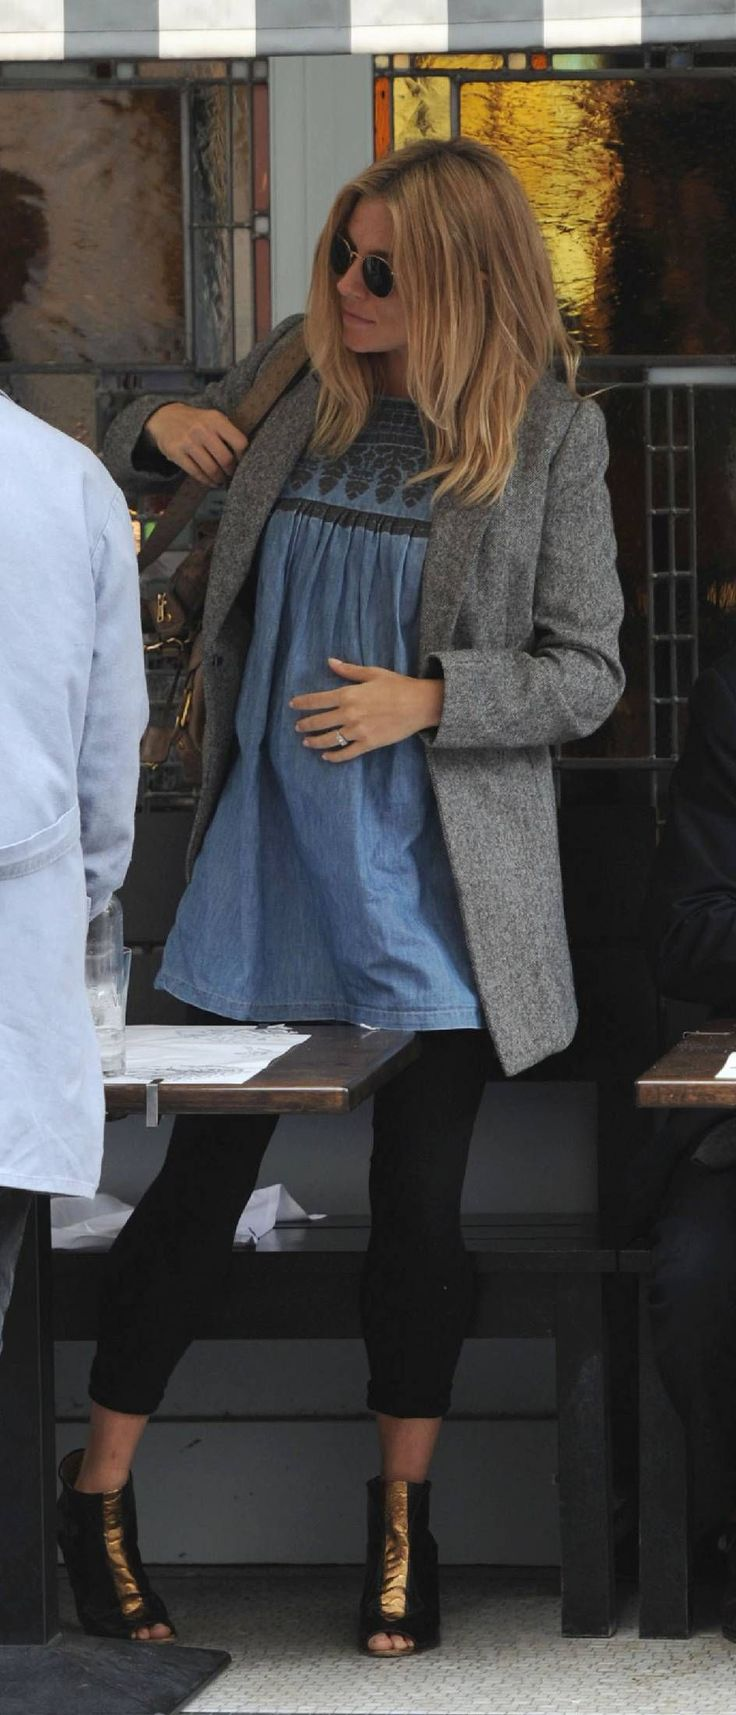 sienna miller pregnancy/maternity style